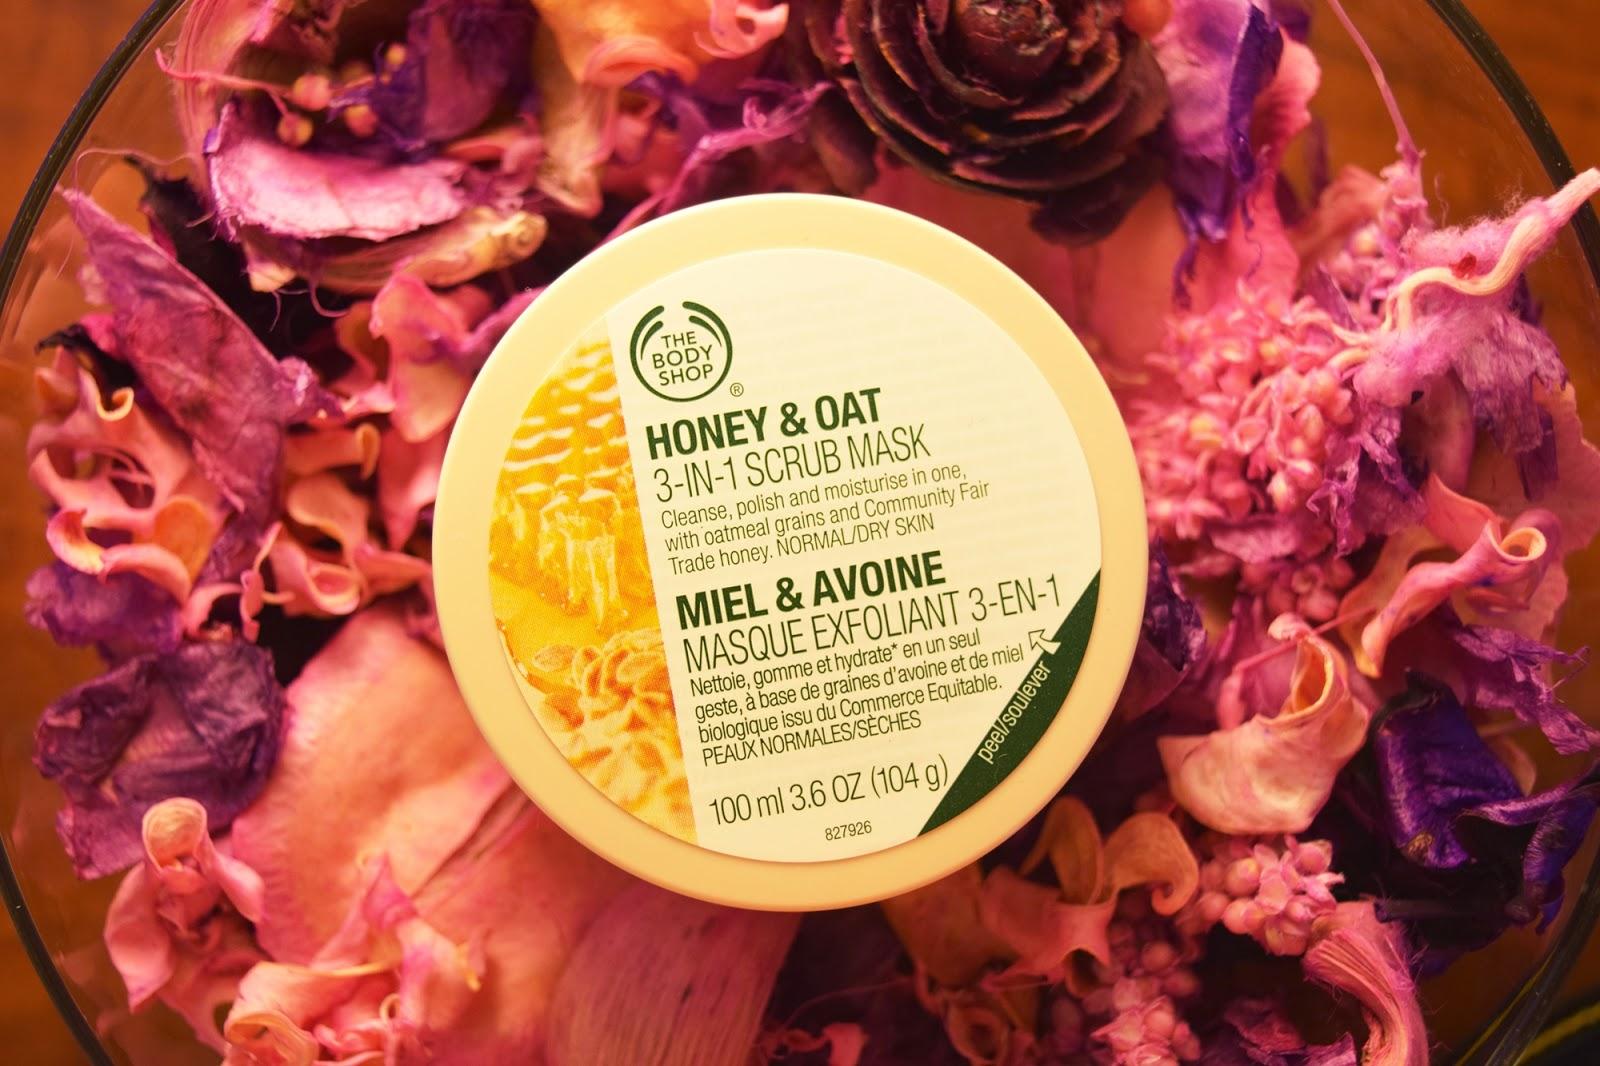 Honey & Oat 3-in-1 Scrub Mask The Body Shop